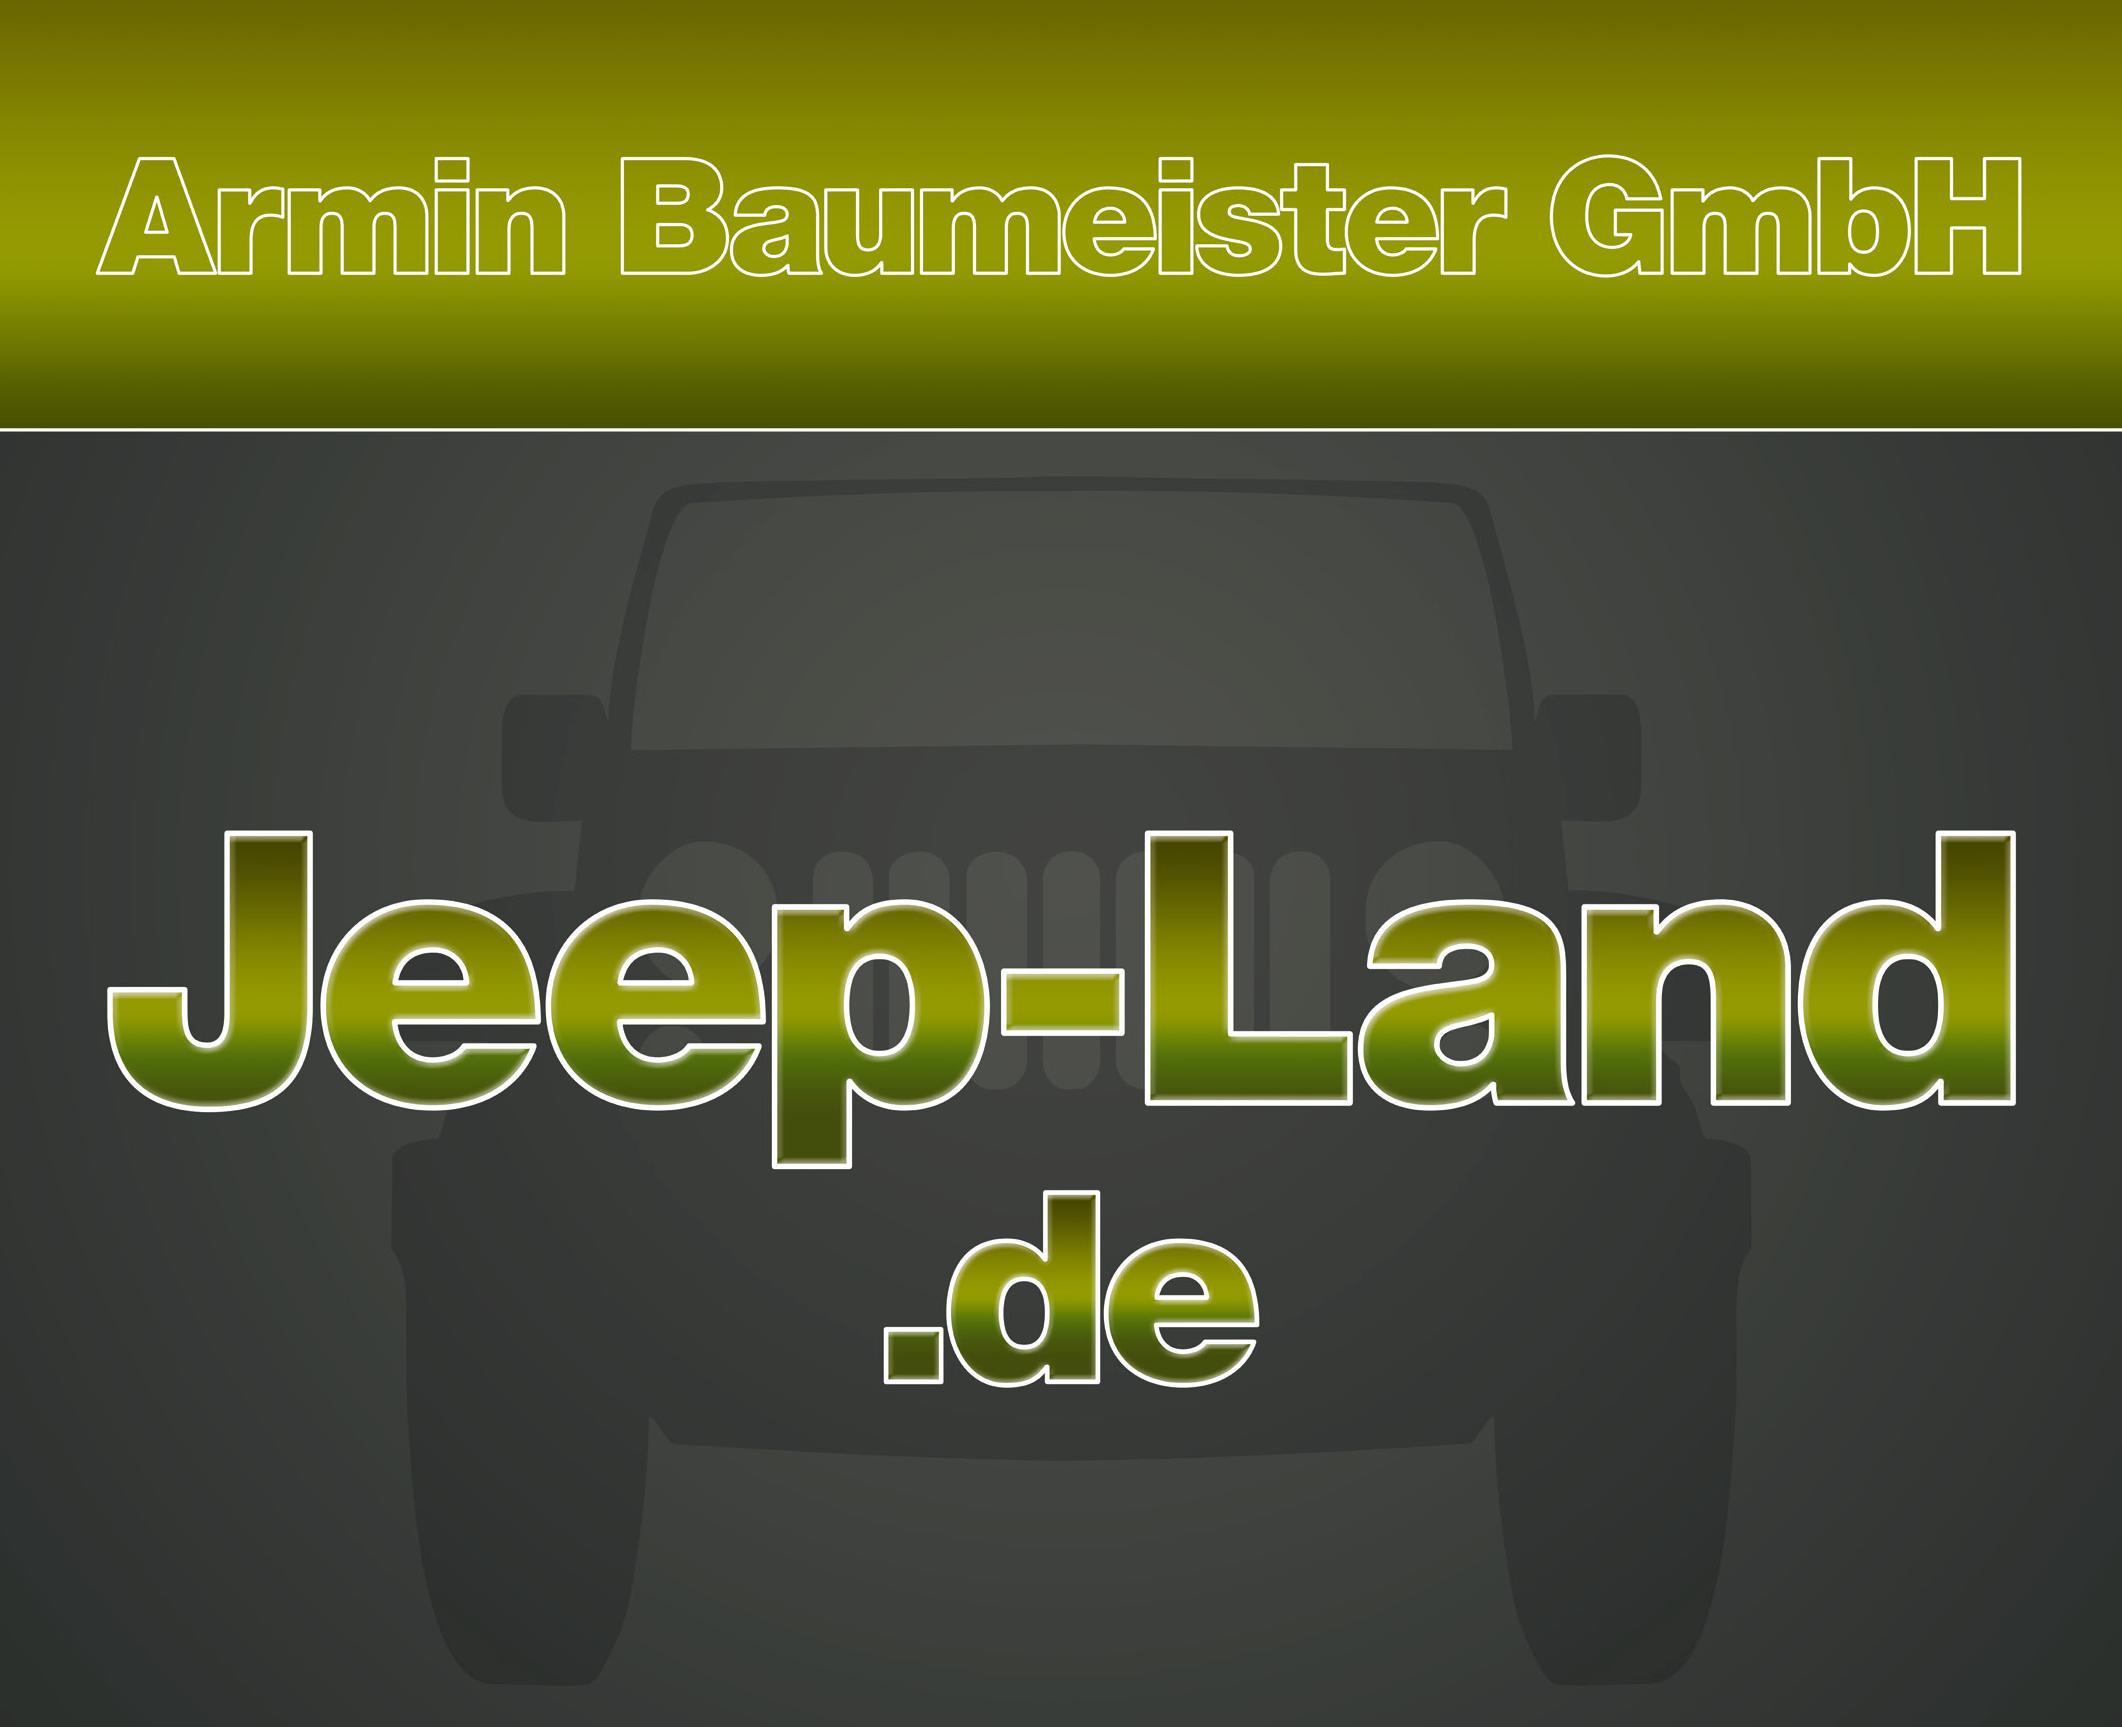 JeepLand